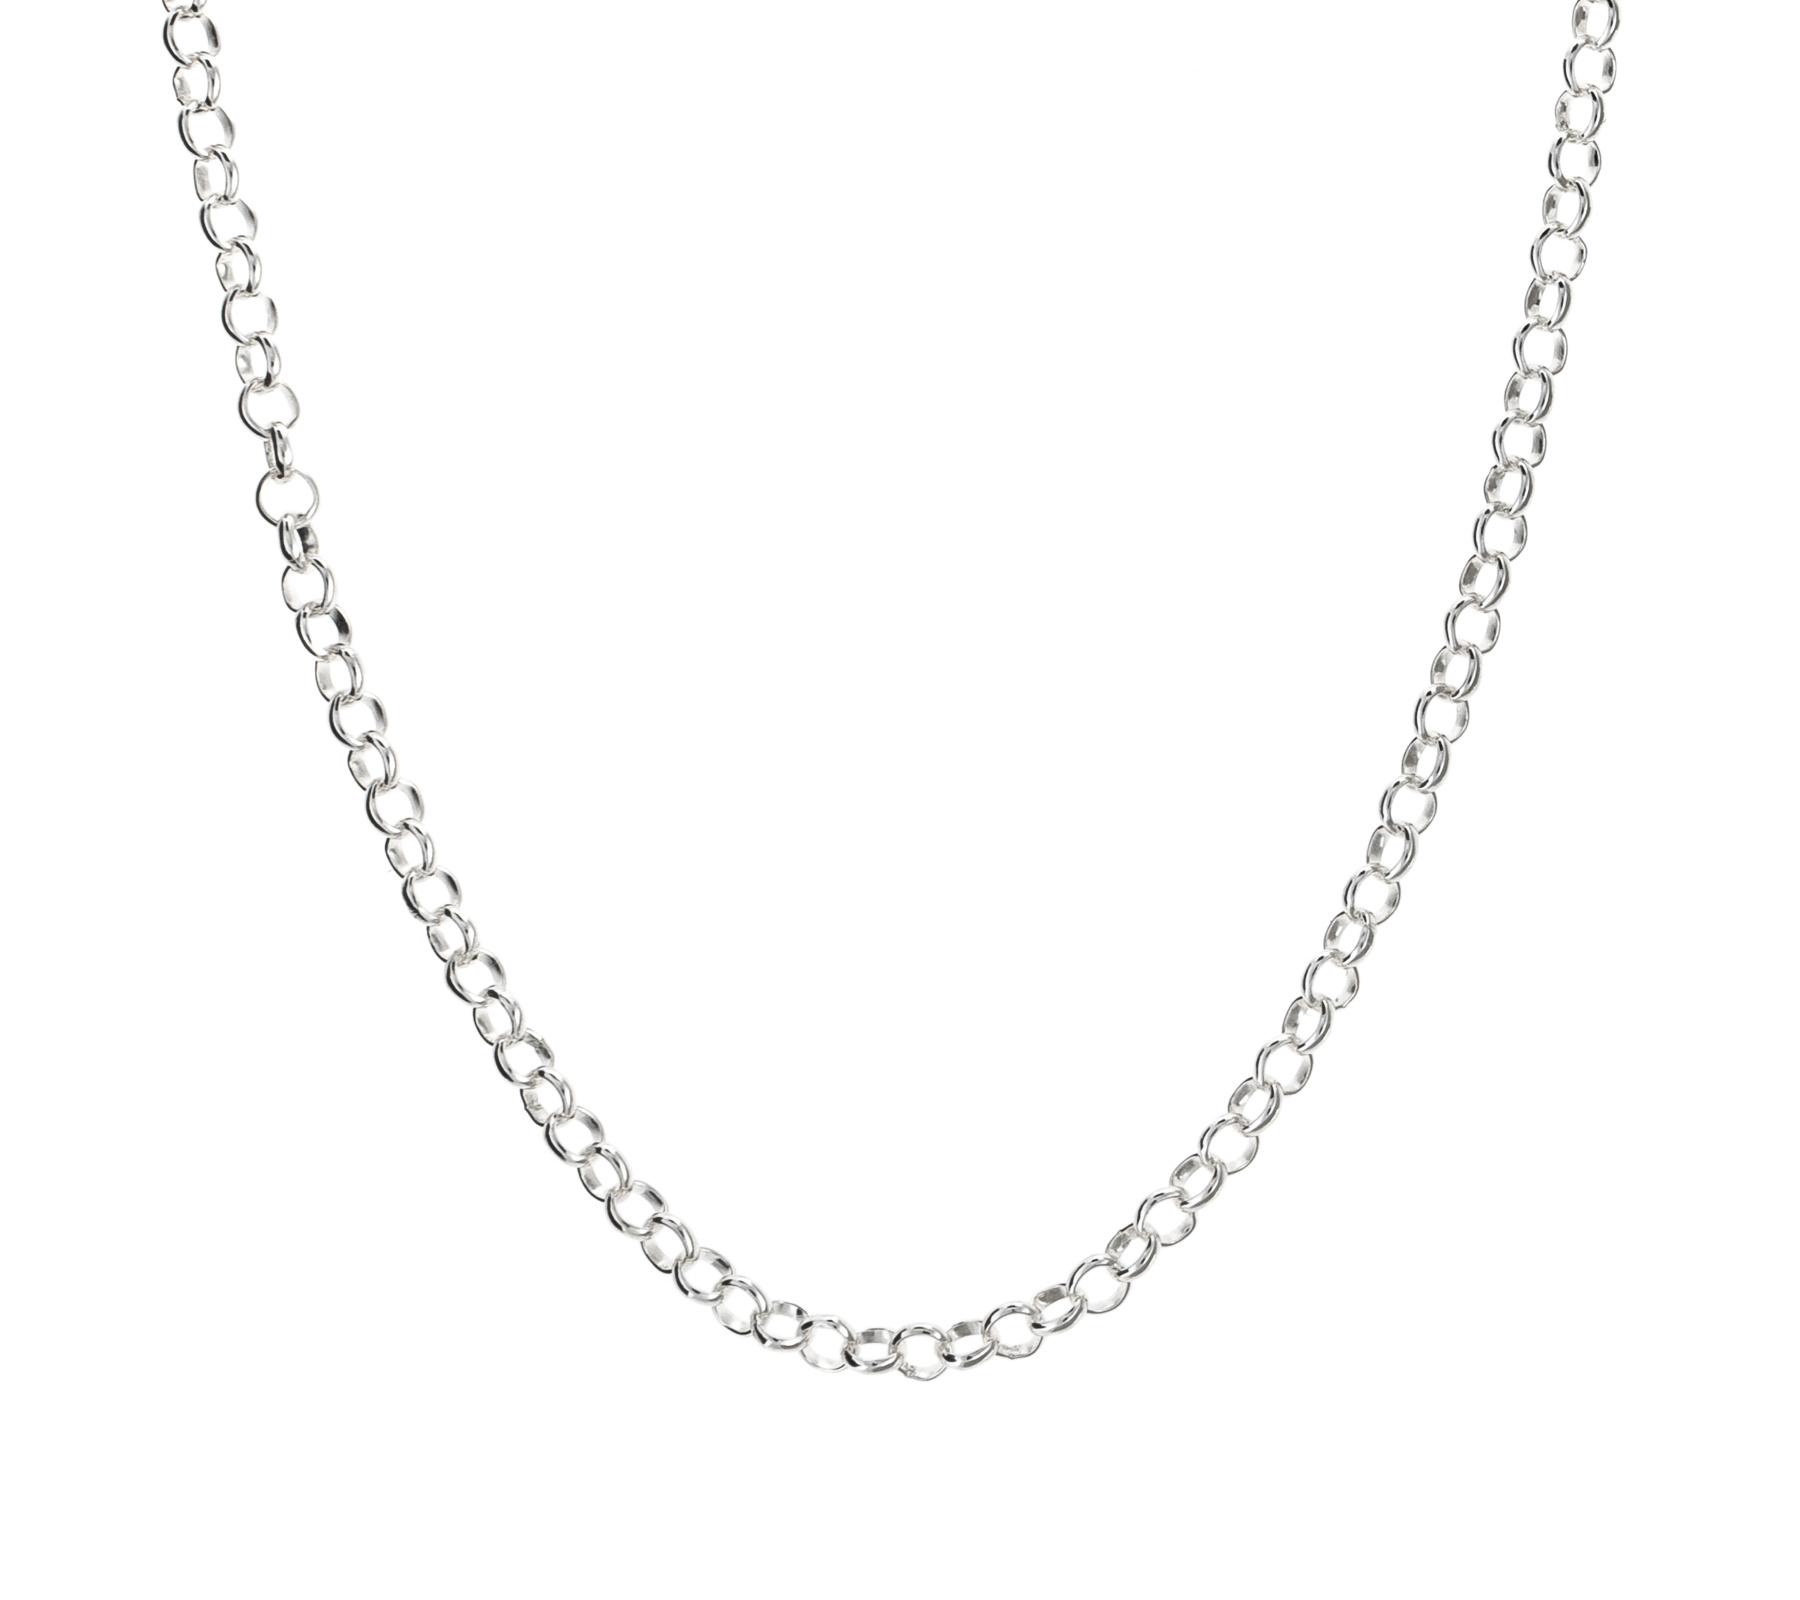 Silver chain jasseron-1